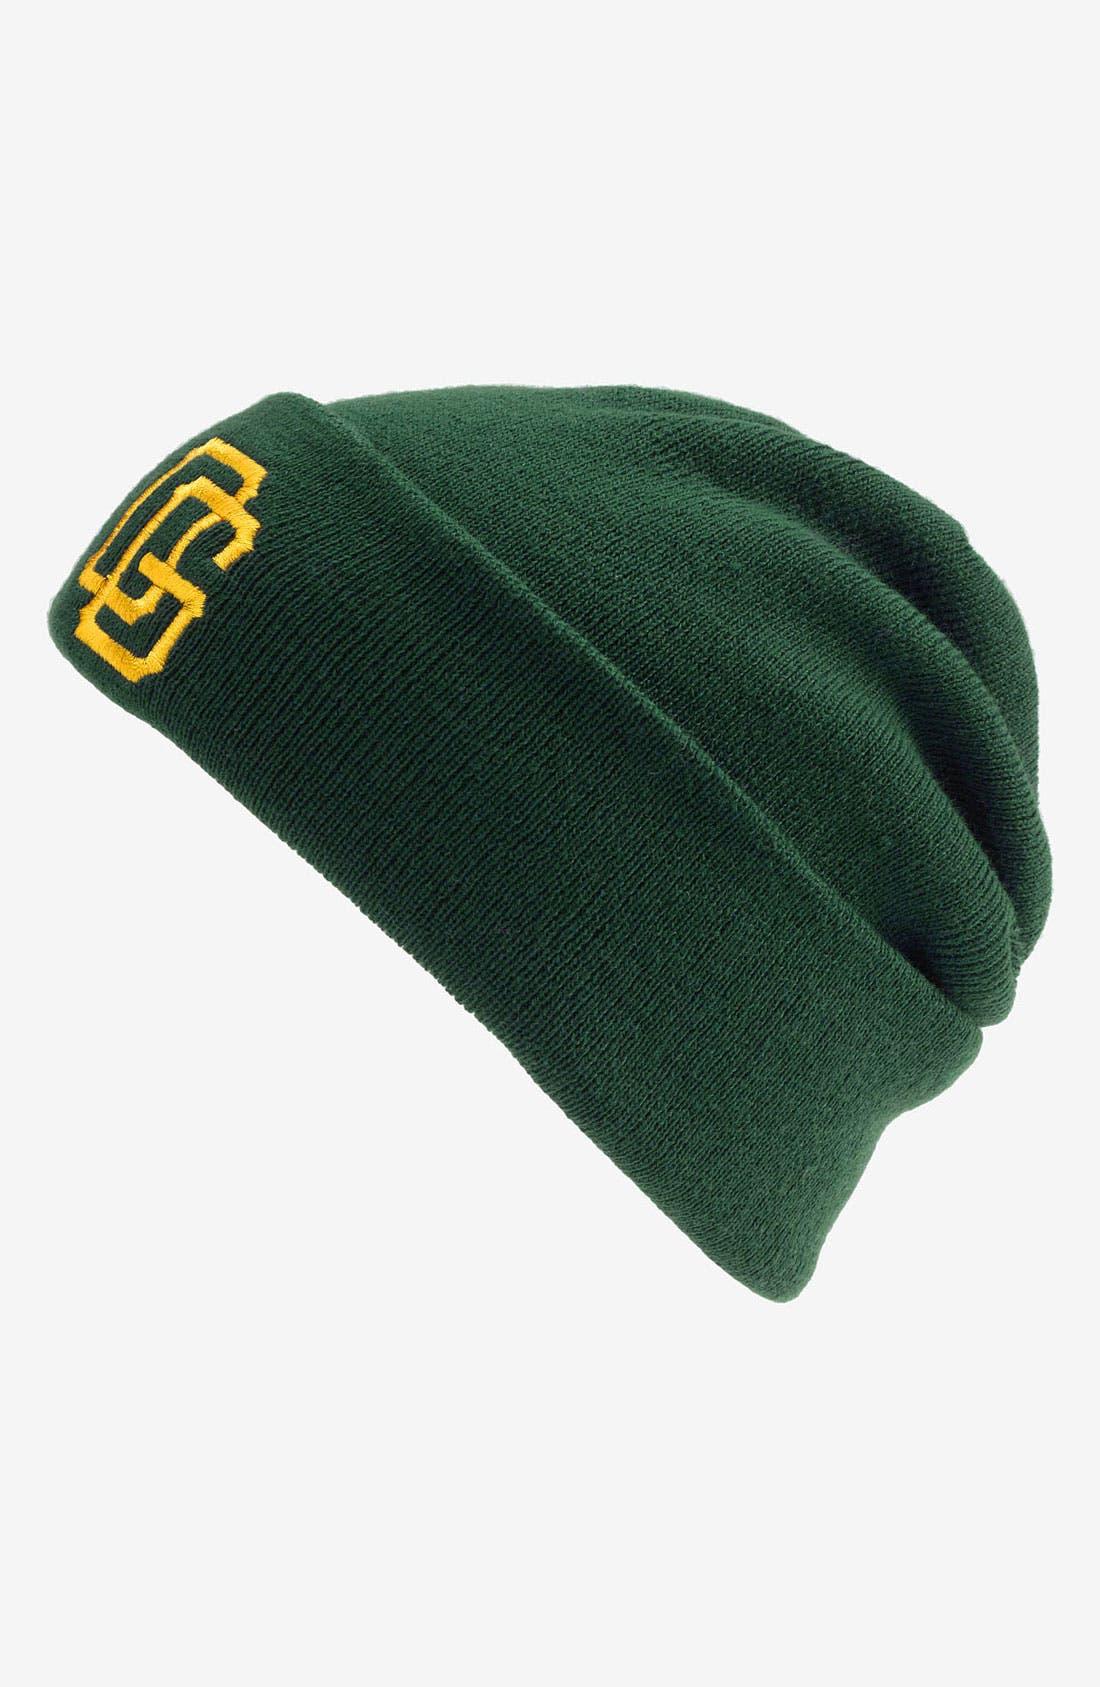 Alternate Image 1 Selected - Obey 'Double OG' Knit Cap